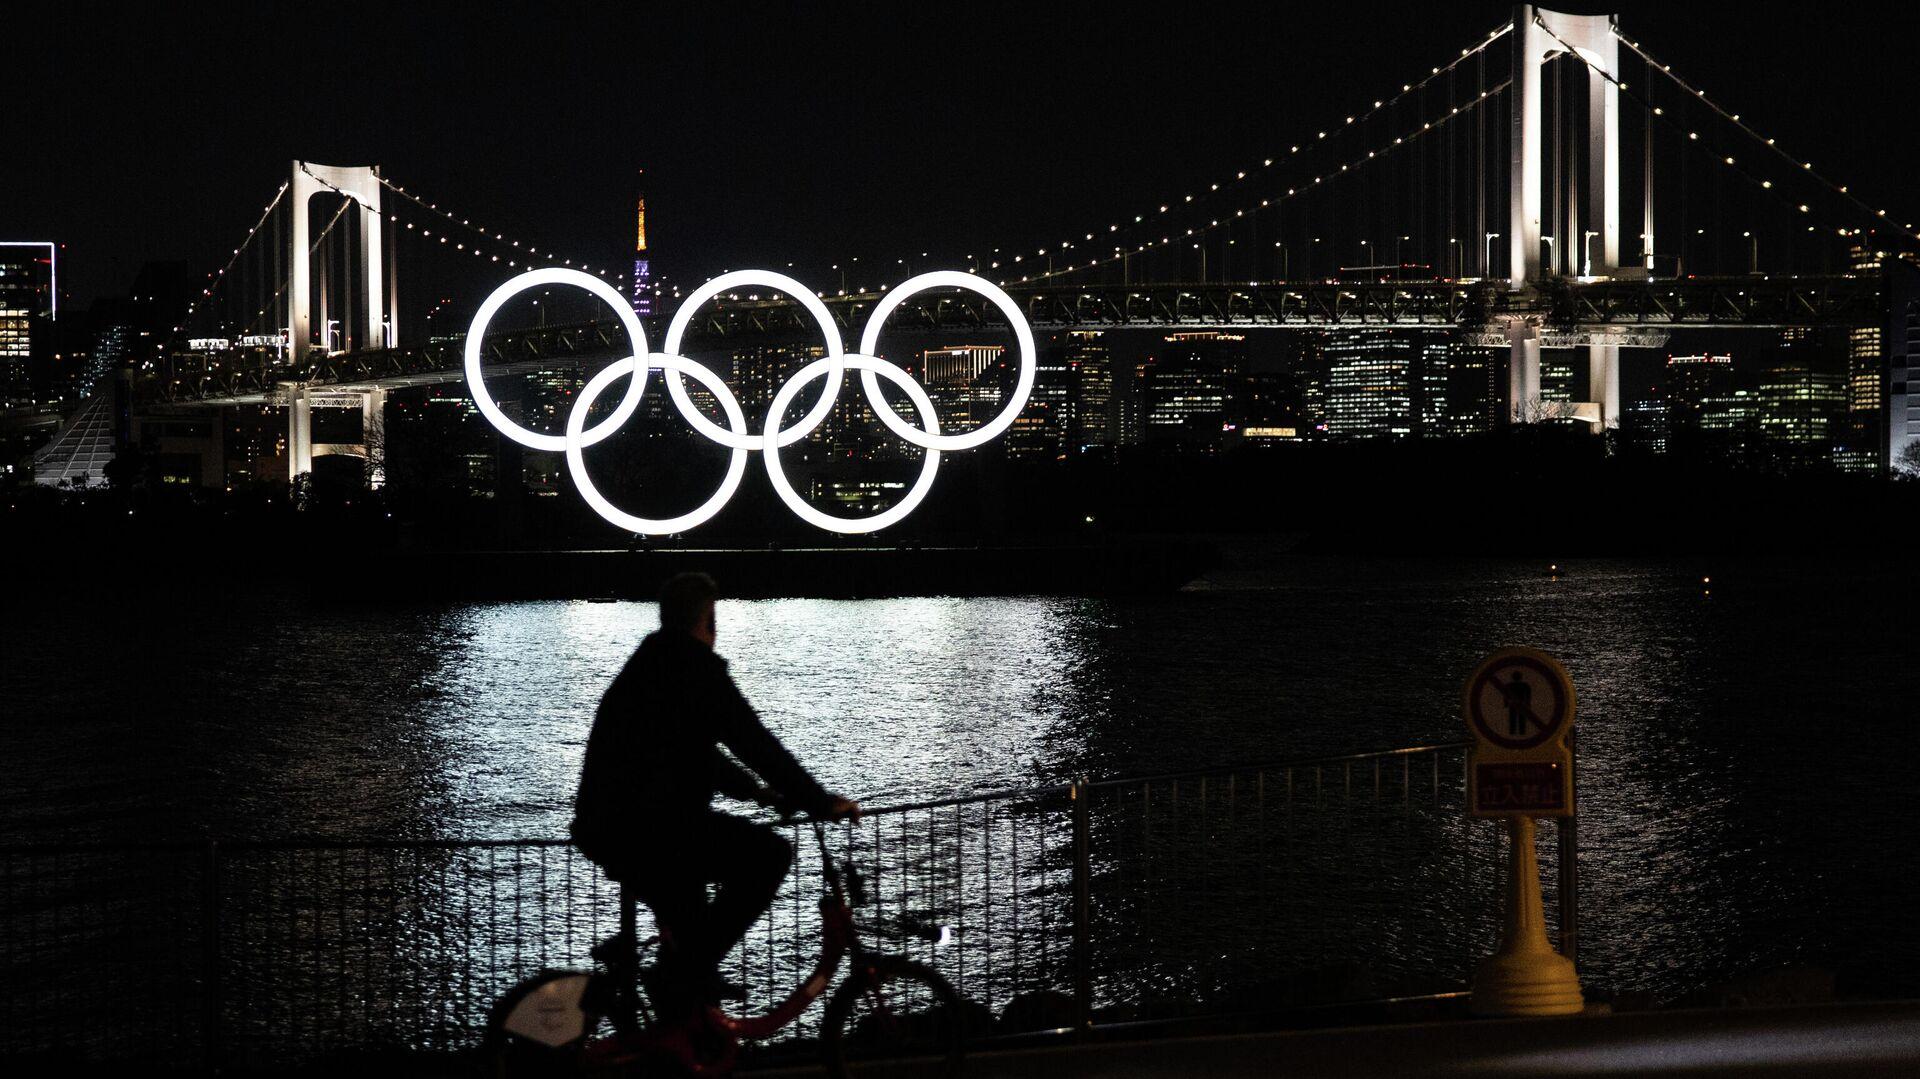 Олимпийские кольца в Токио - РИА Новости, 1920, 20.03.2021